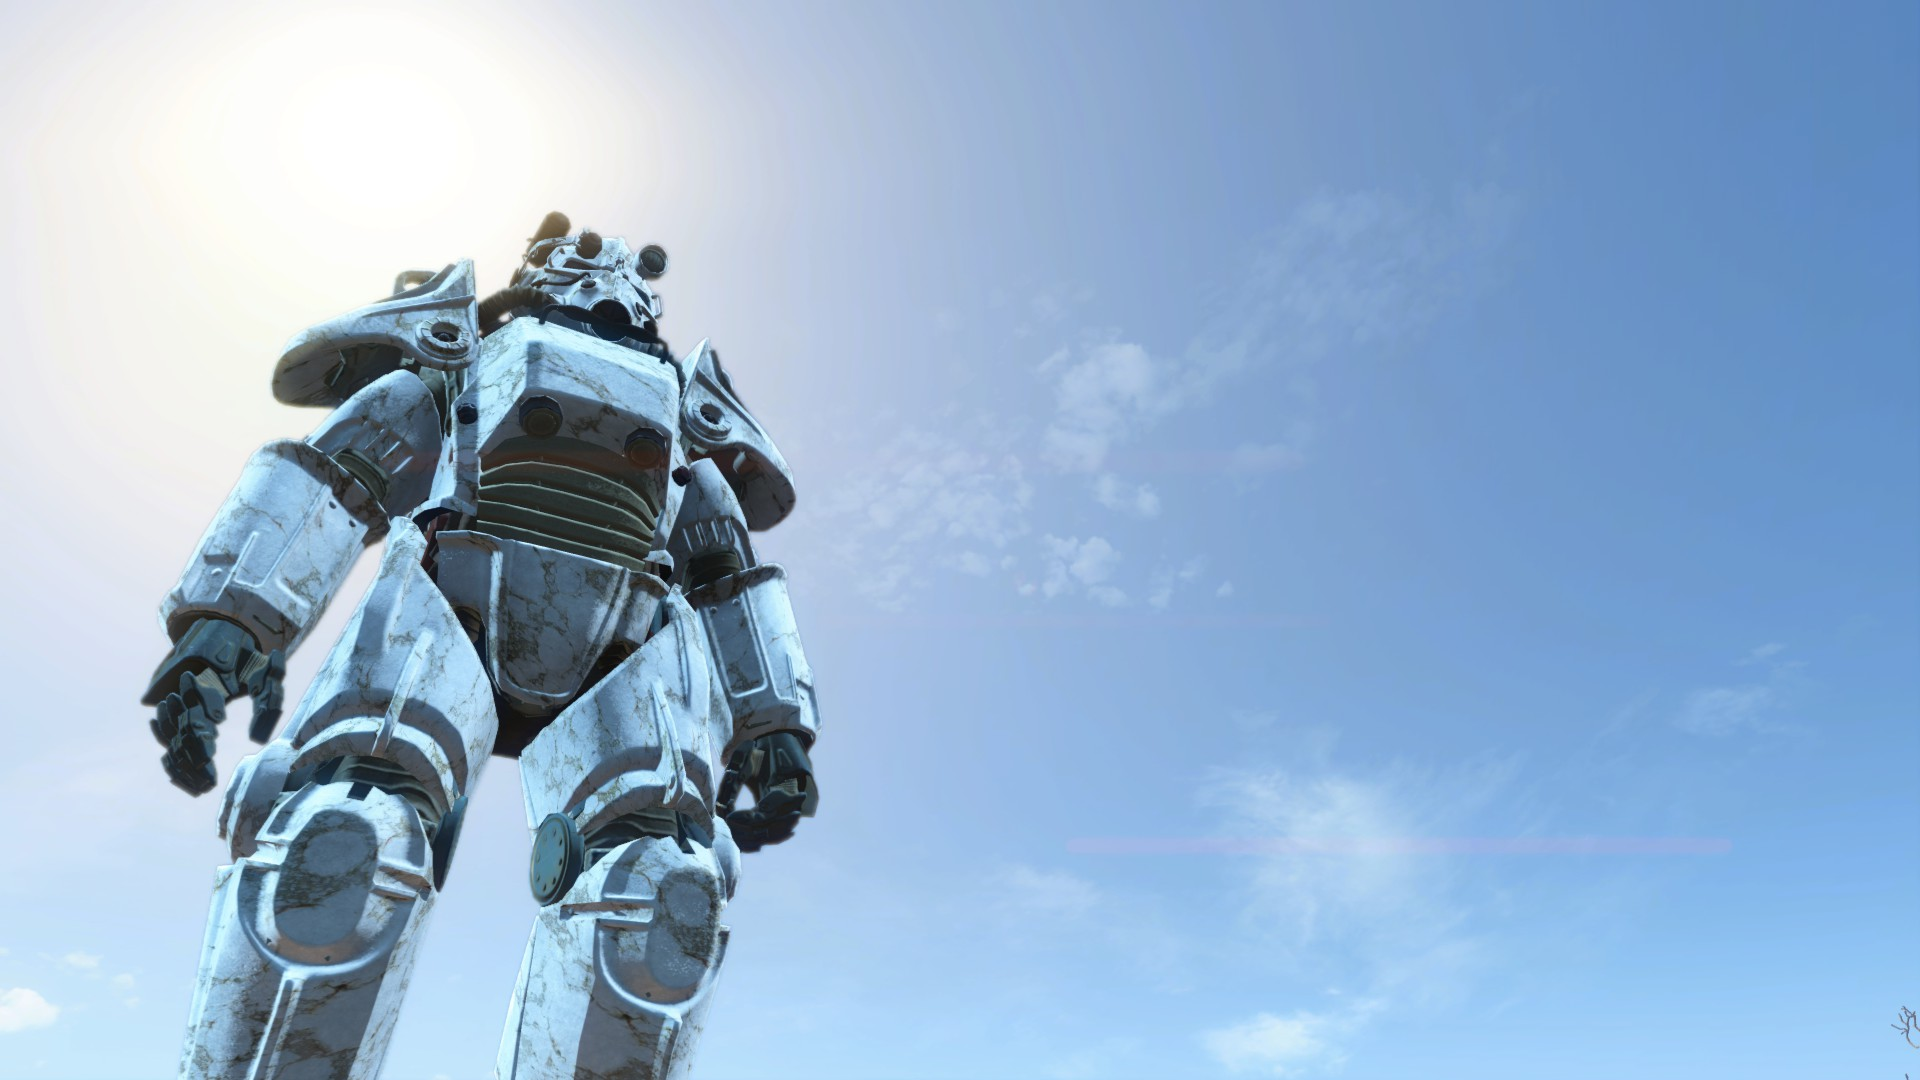 20190420221107_1.jpg - Fallout 4